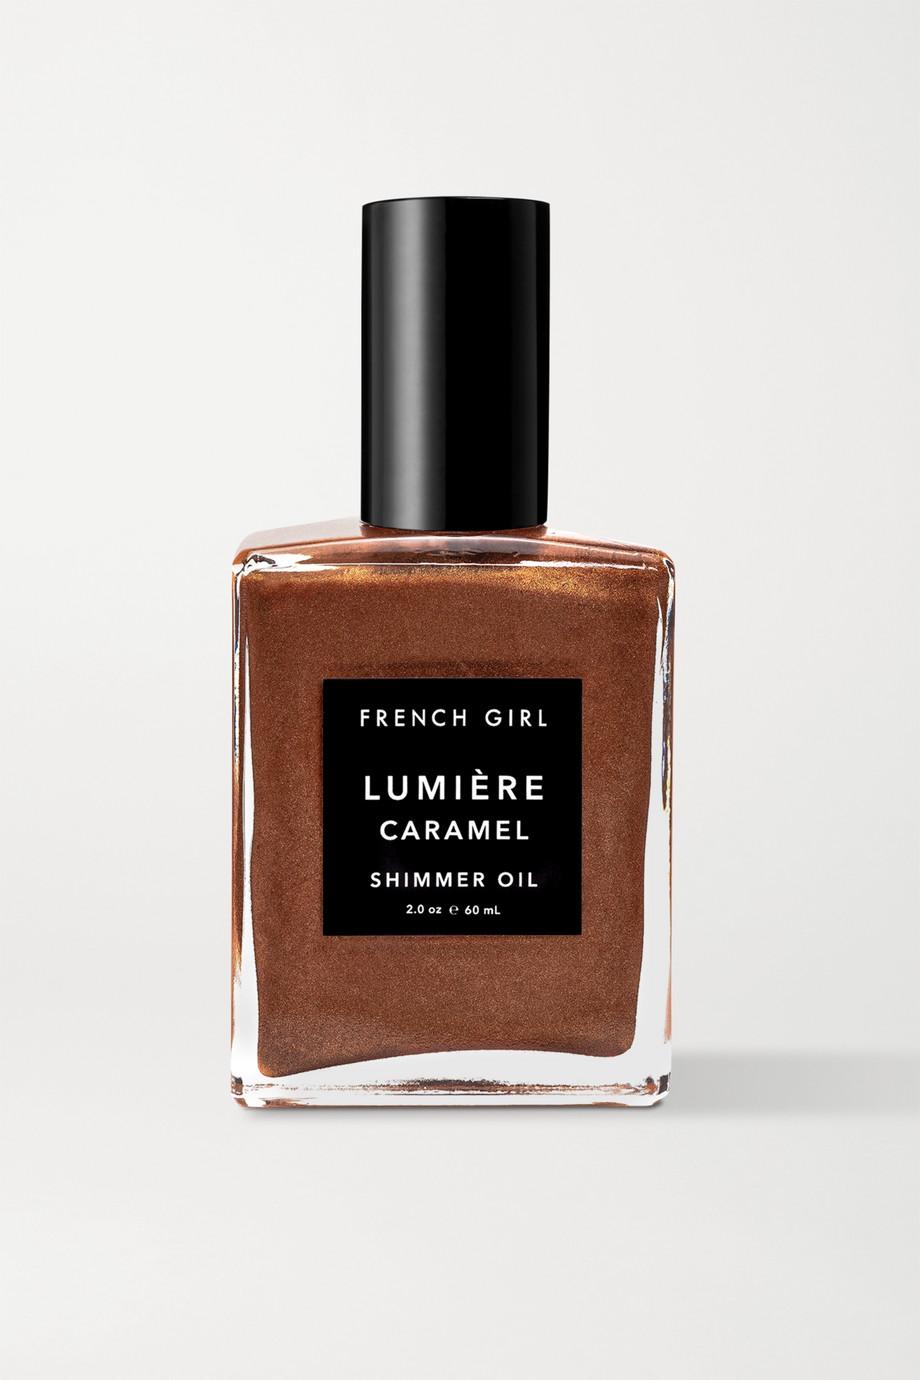 French Girl Organics Lumière Caramel Shimmer Oil, 60ml